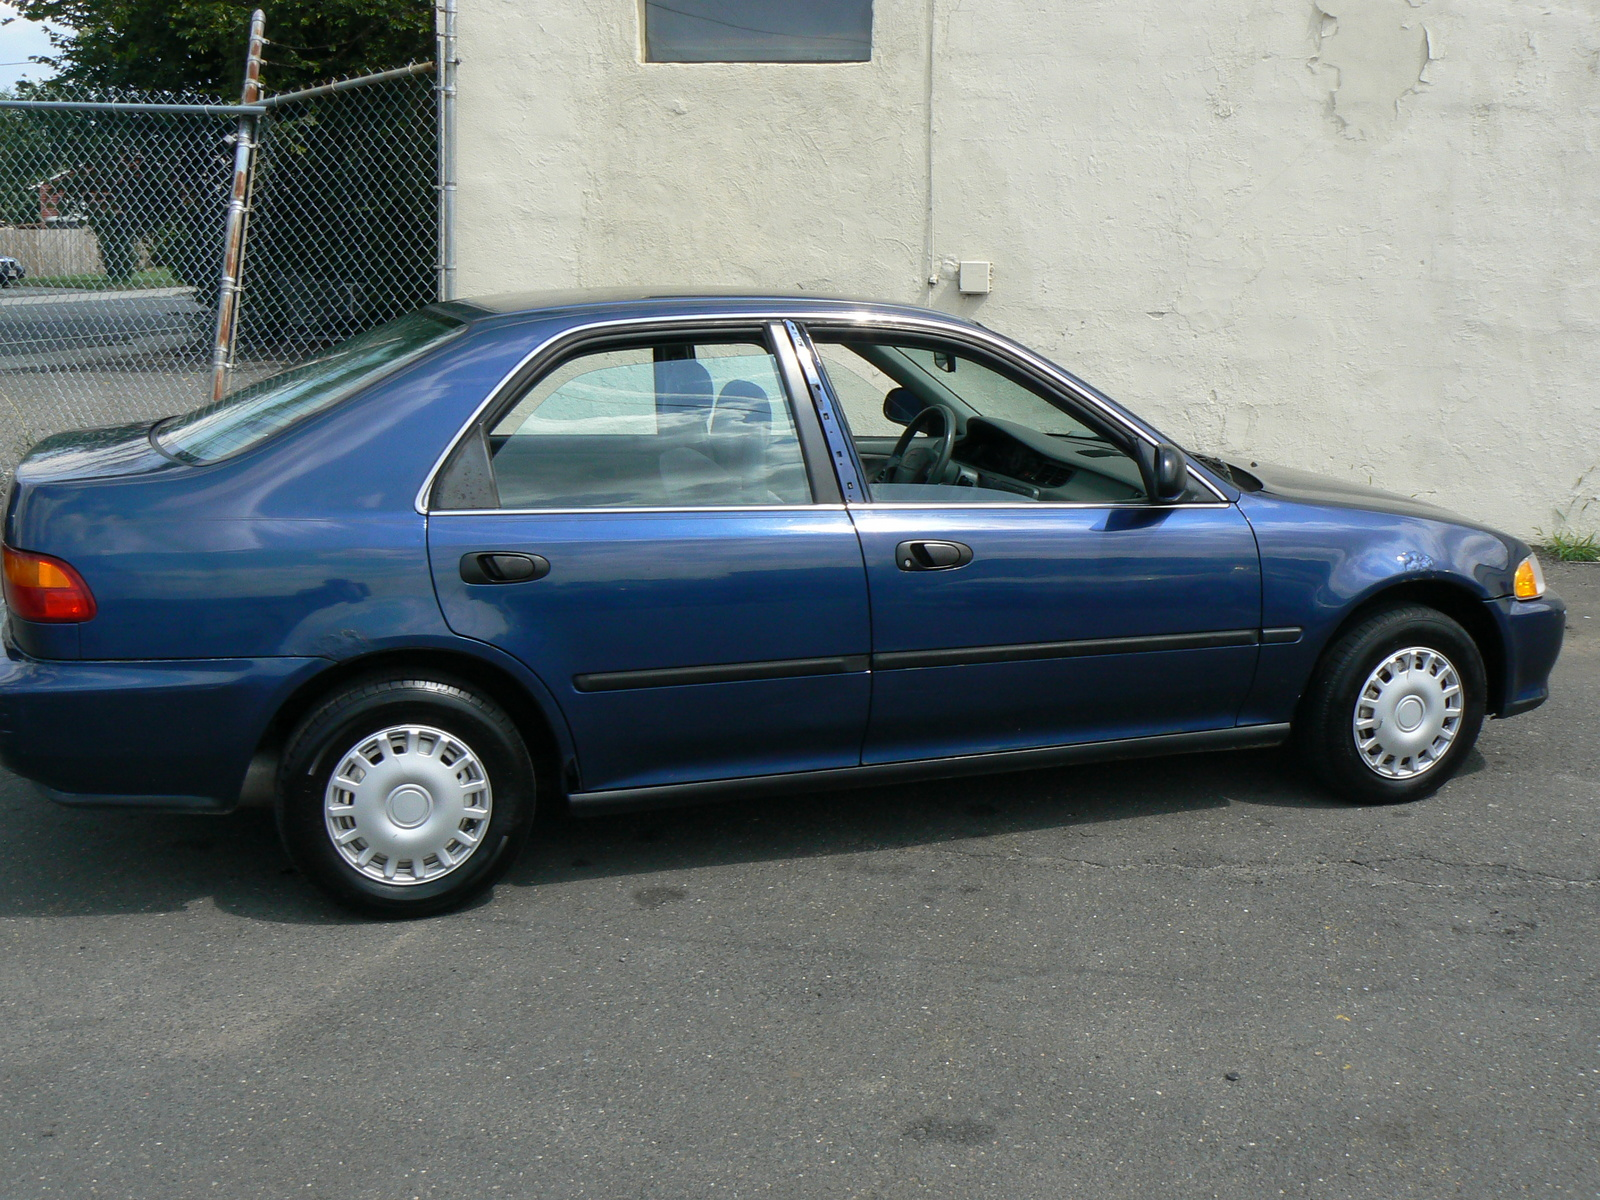 2012 honda civic prices autos post for 2012 honda civic dx